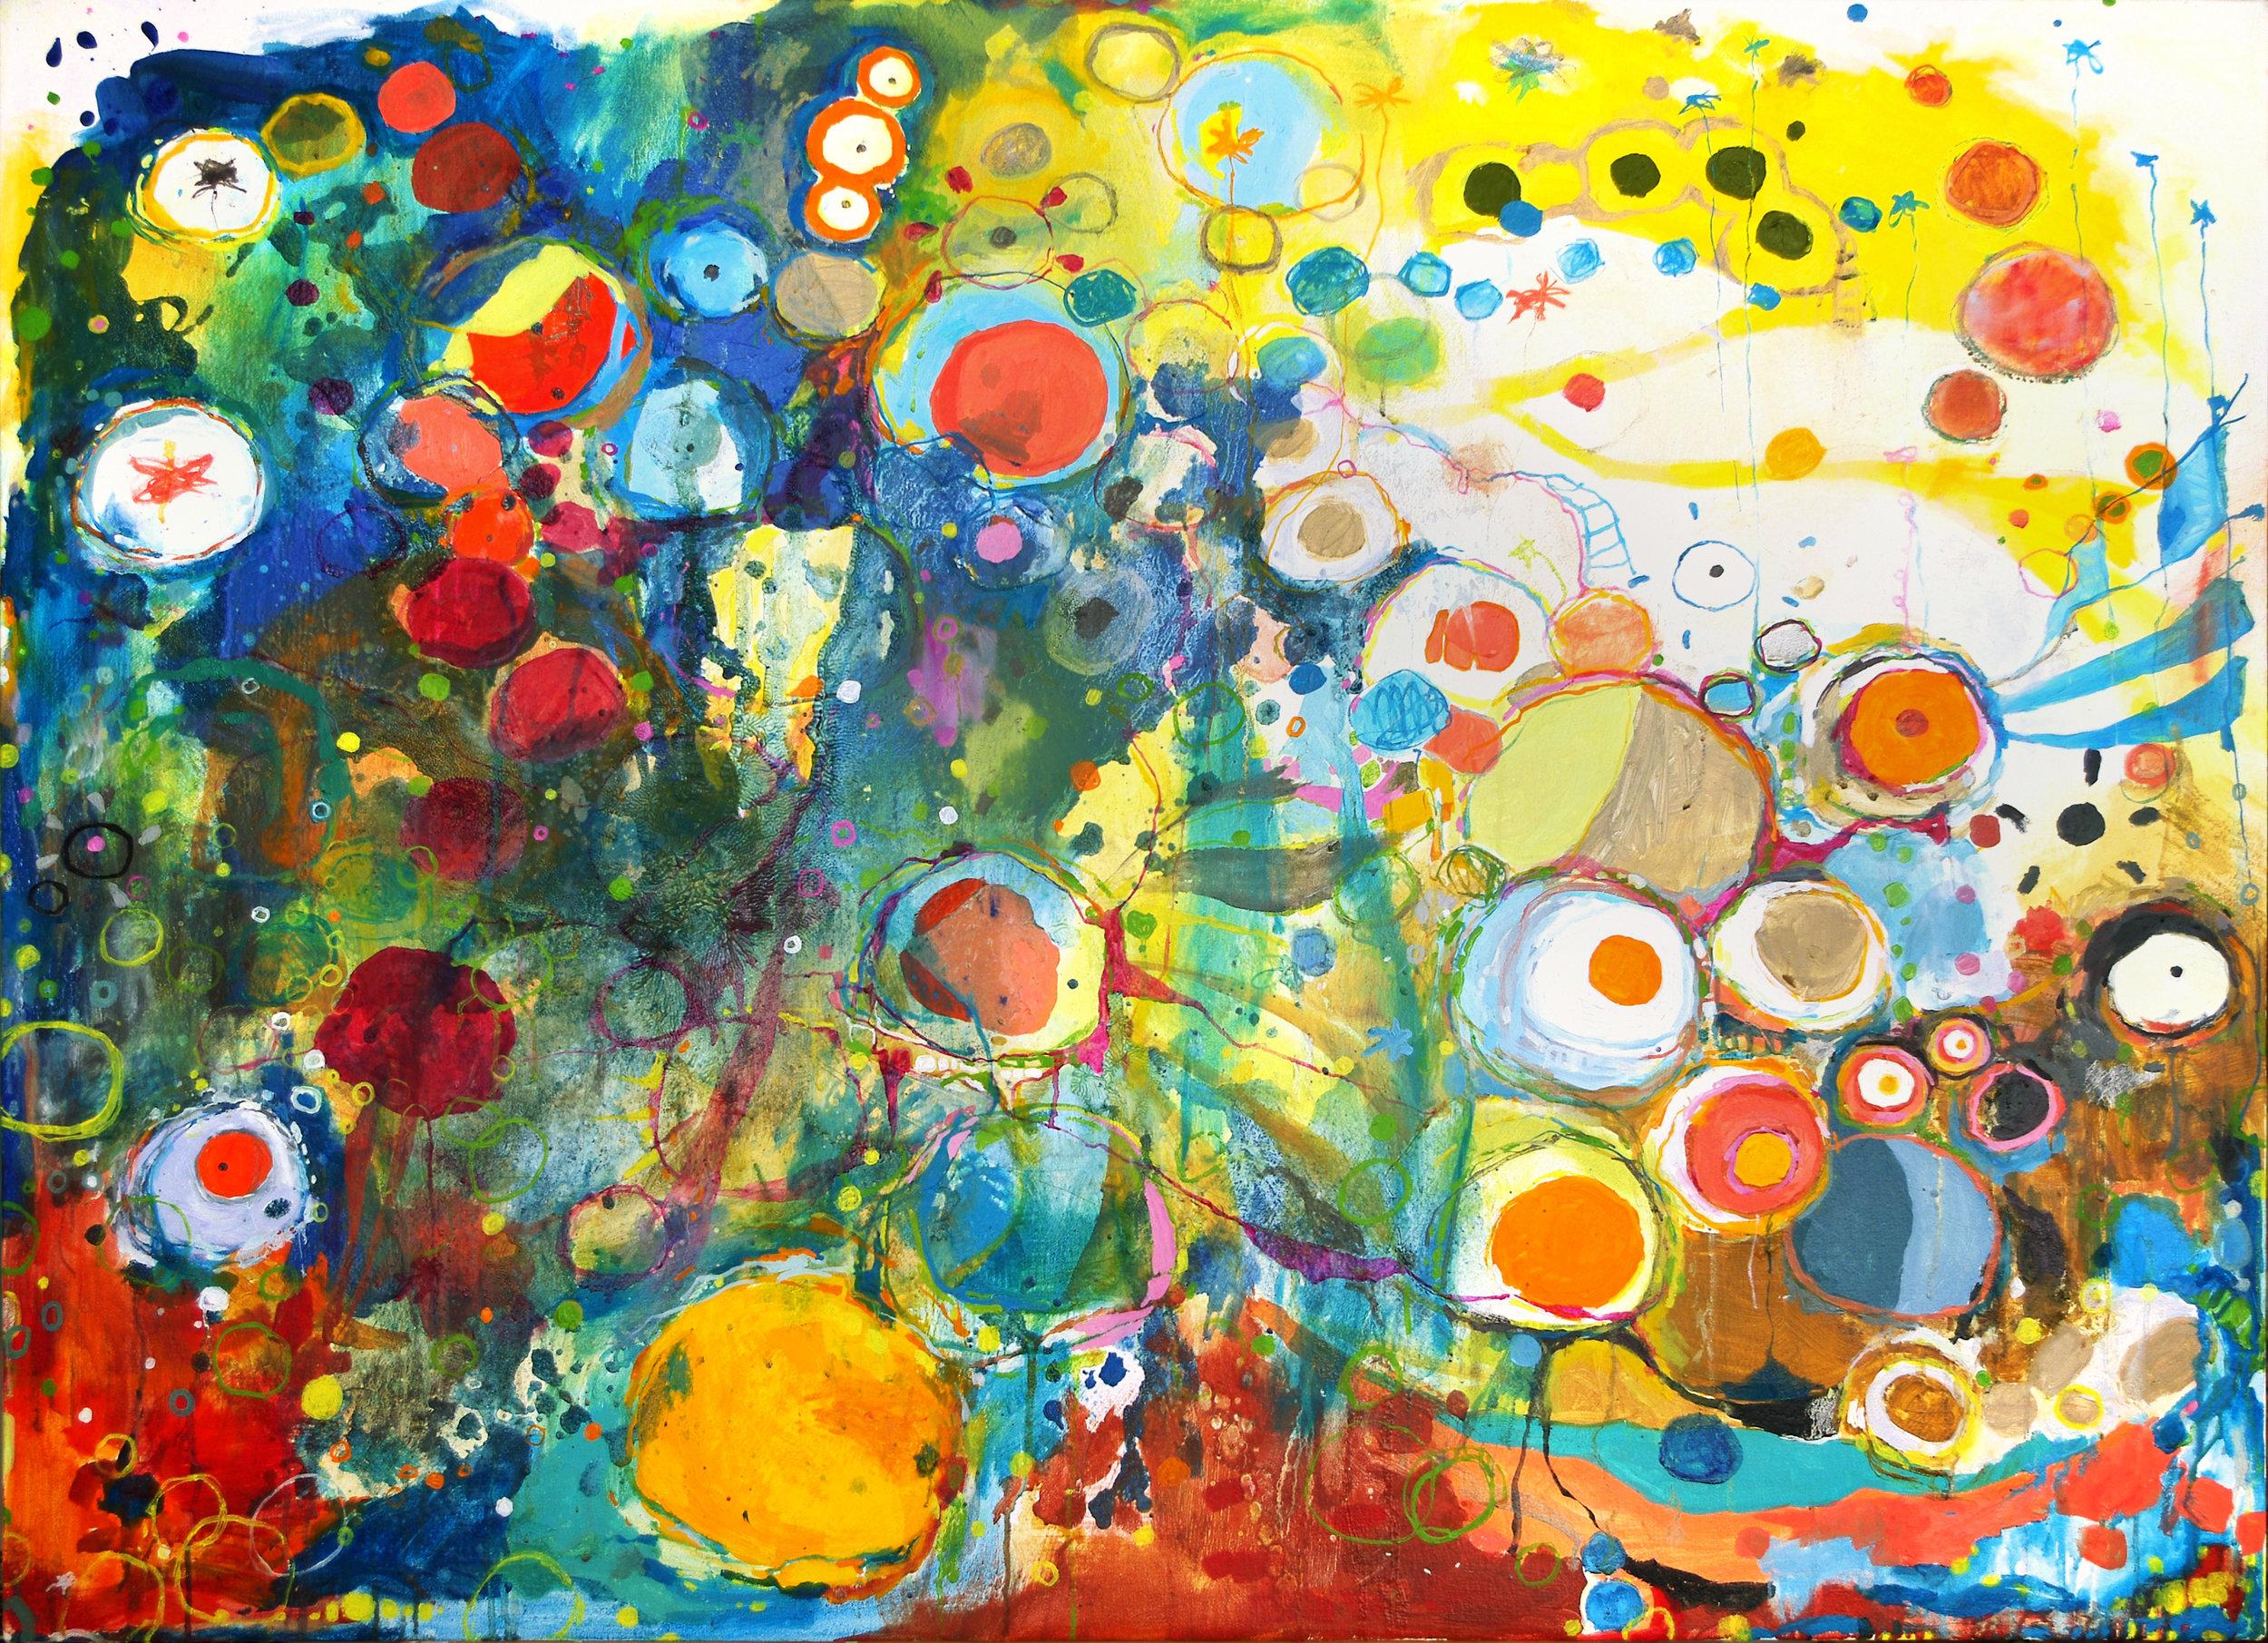 "Chaos Magic (#40), 2013 - Oil on canvas, 36"" x 50"""